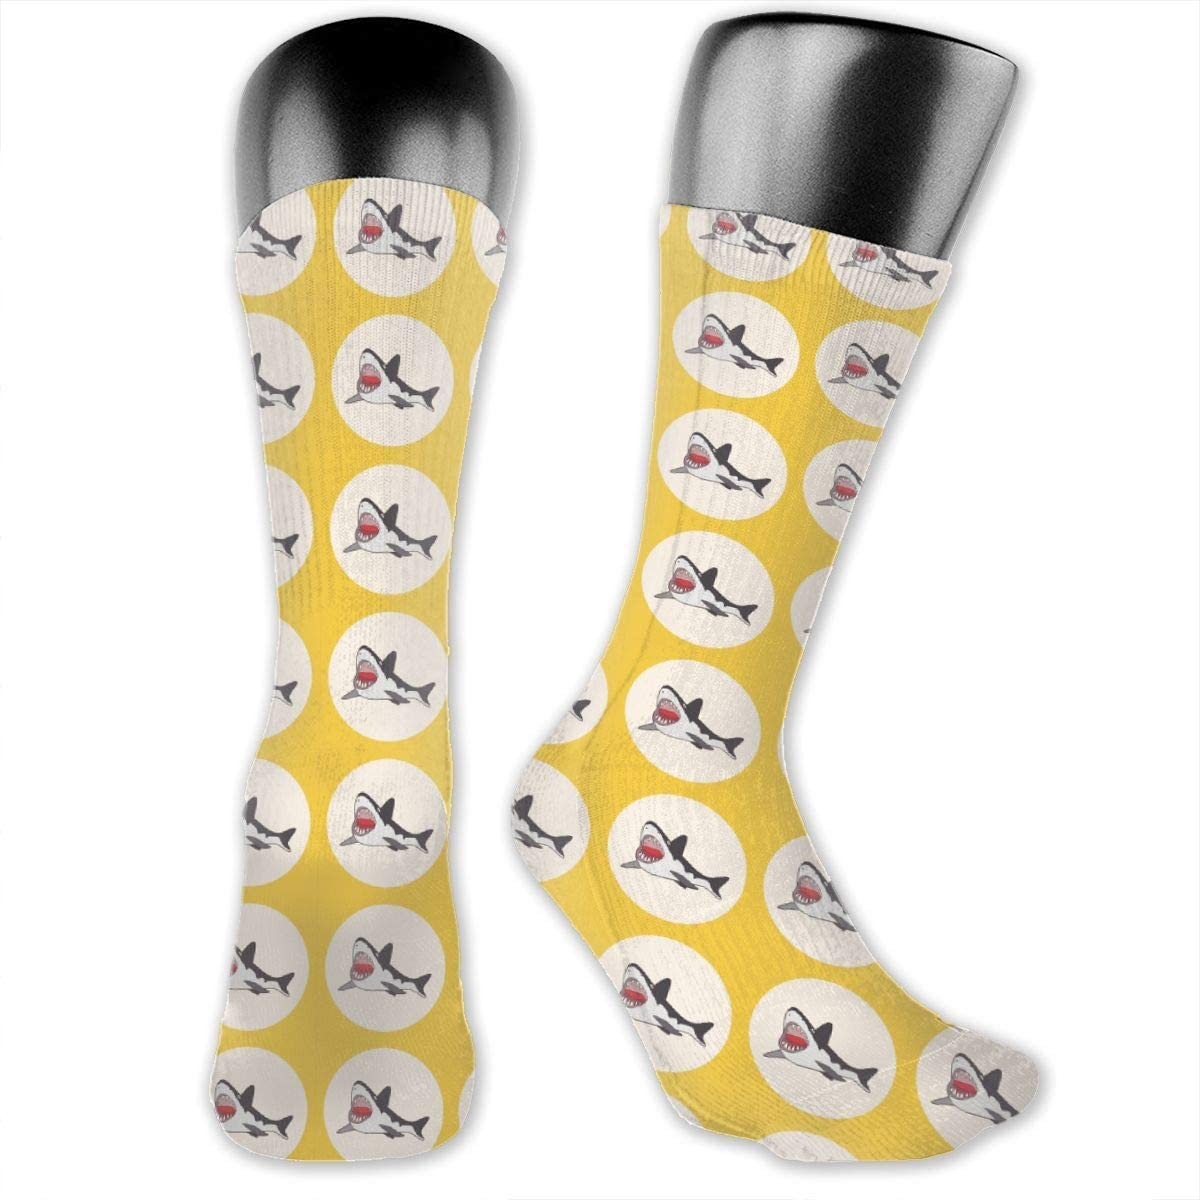 Athletic Hiking Socks New sales Cushioned Max 84% OFF Crew Non Compression Slip